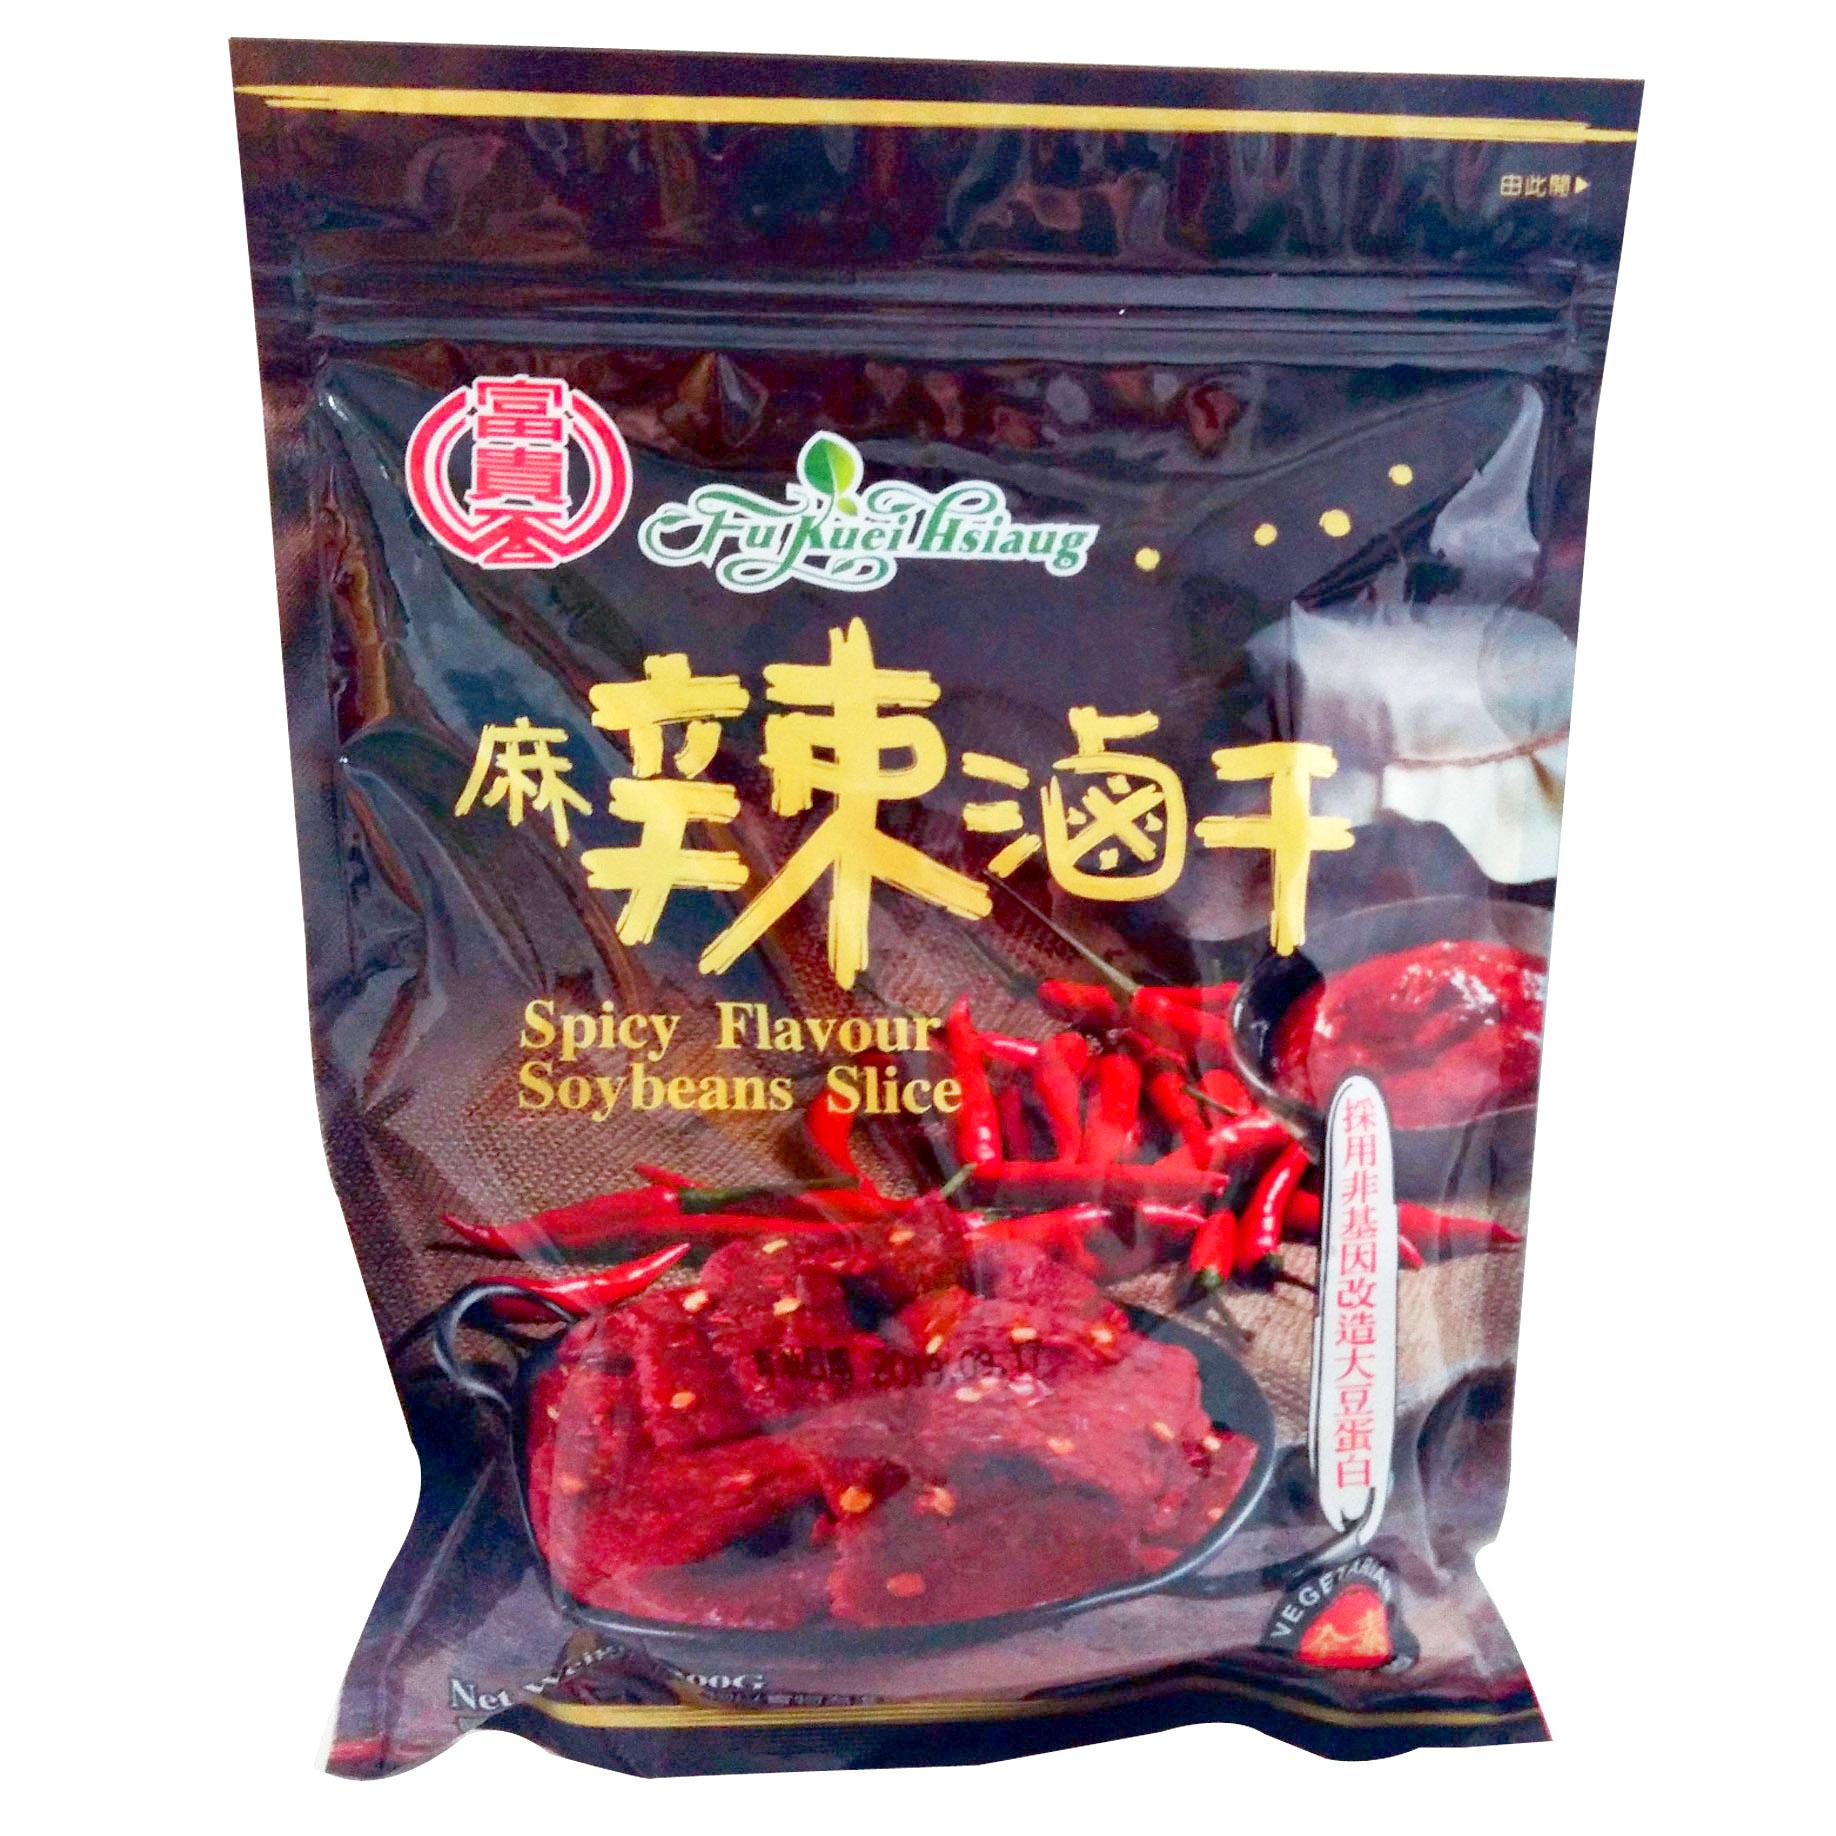 Image Mala Spicy Flavour Soybean Slice 富贵香 - 麻辣滷干 300grams